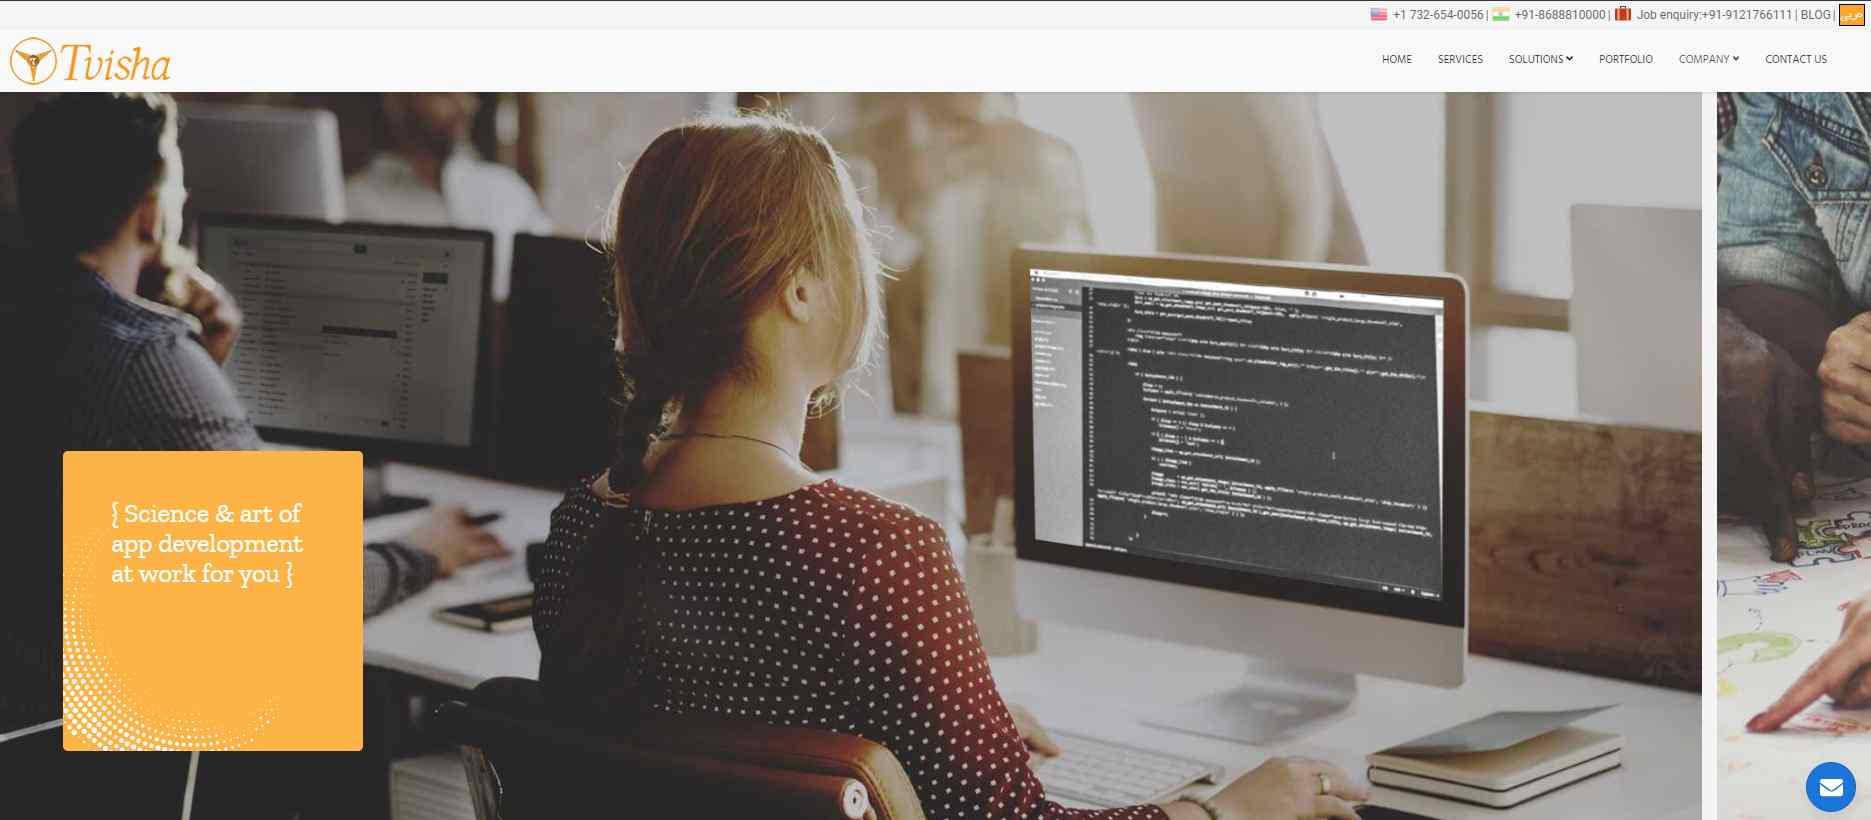 tvisha Top 20 Software Developers in Singapore